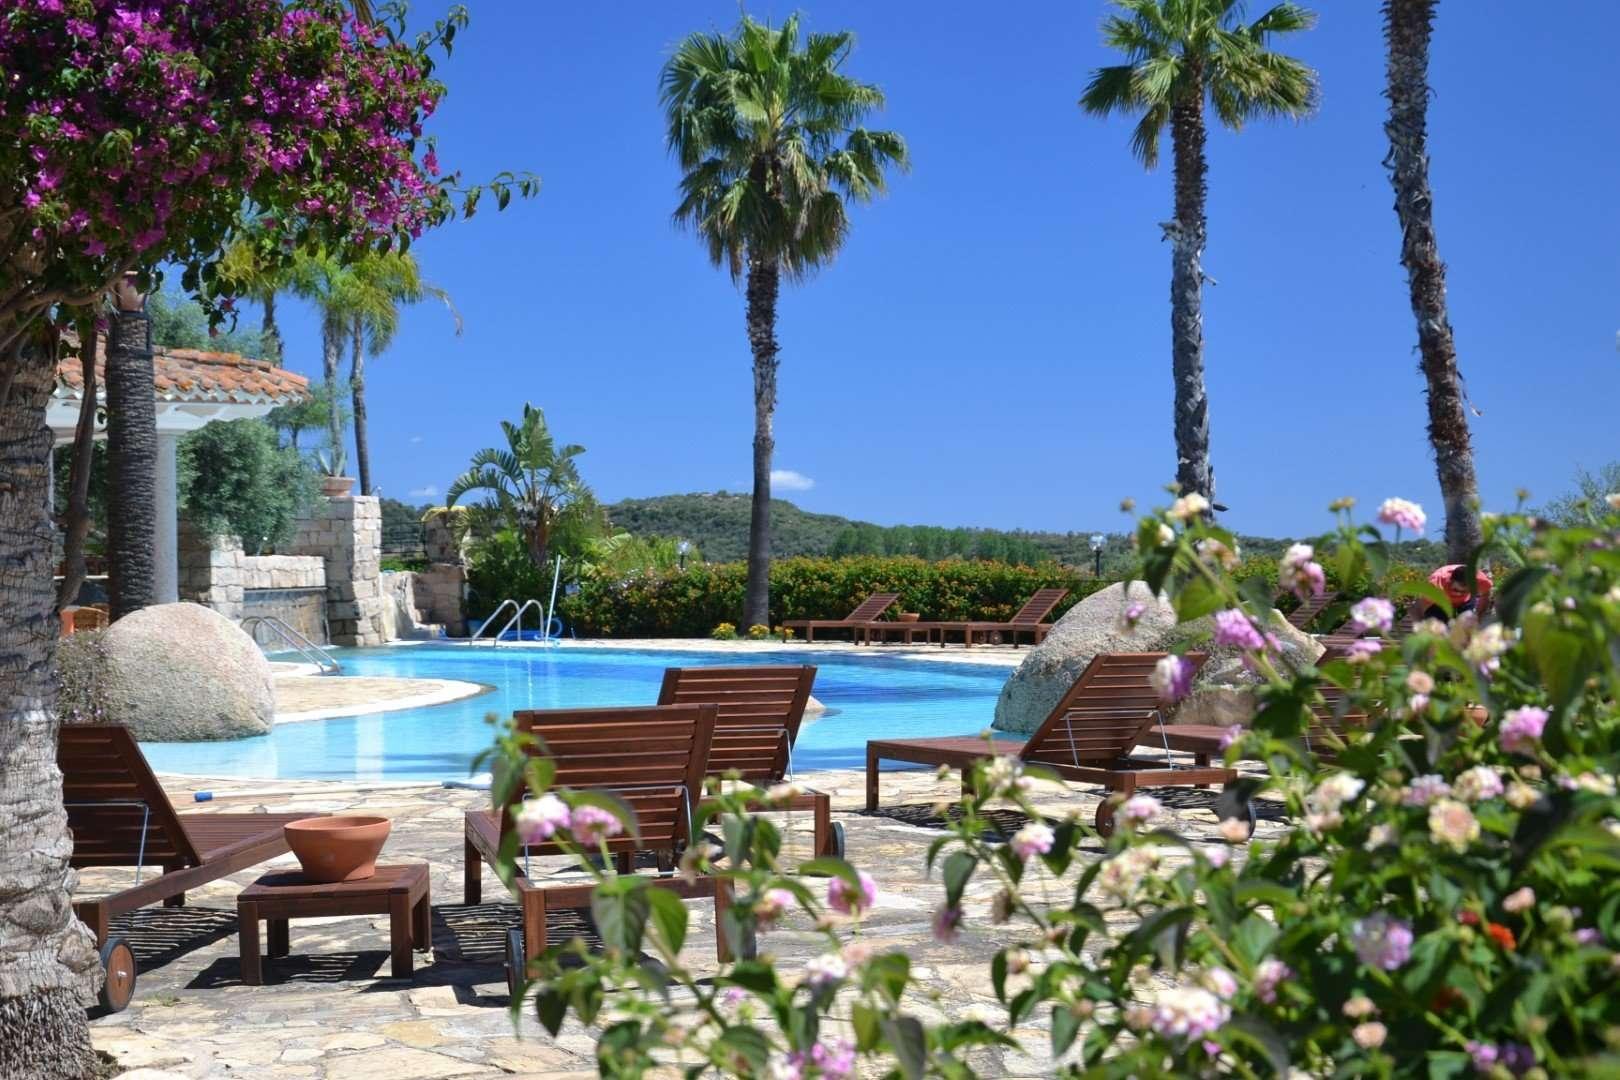 galanias hotel - sardinie - houten ligbedden bij zwembad